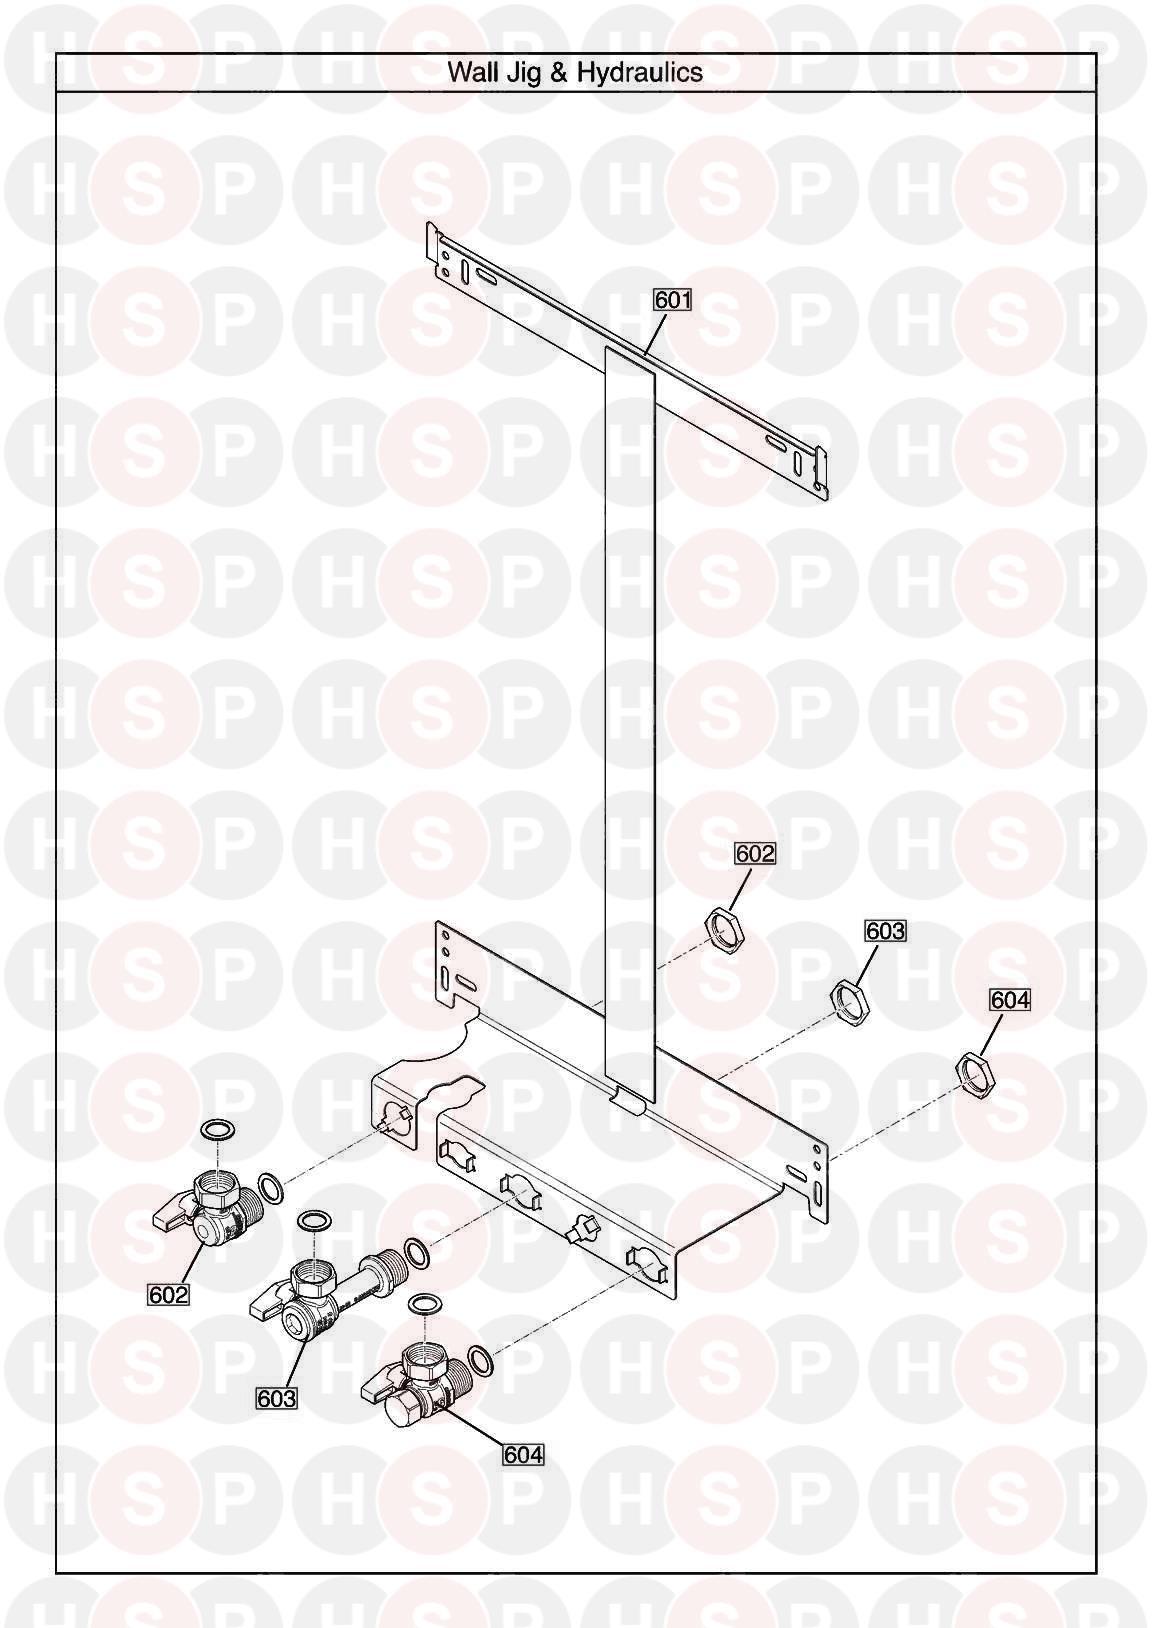 baxi megaflo 2 system 32 compact ga  wall jig  diagram